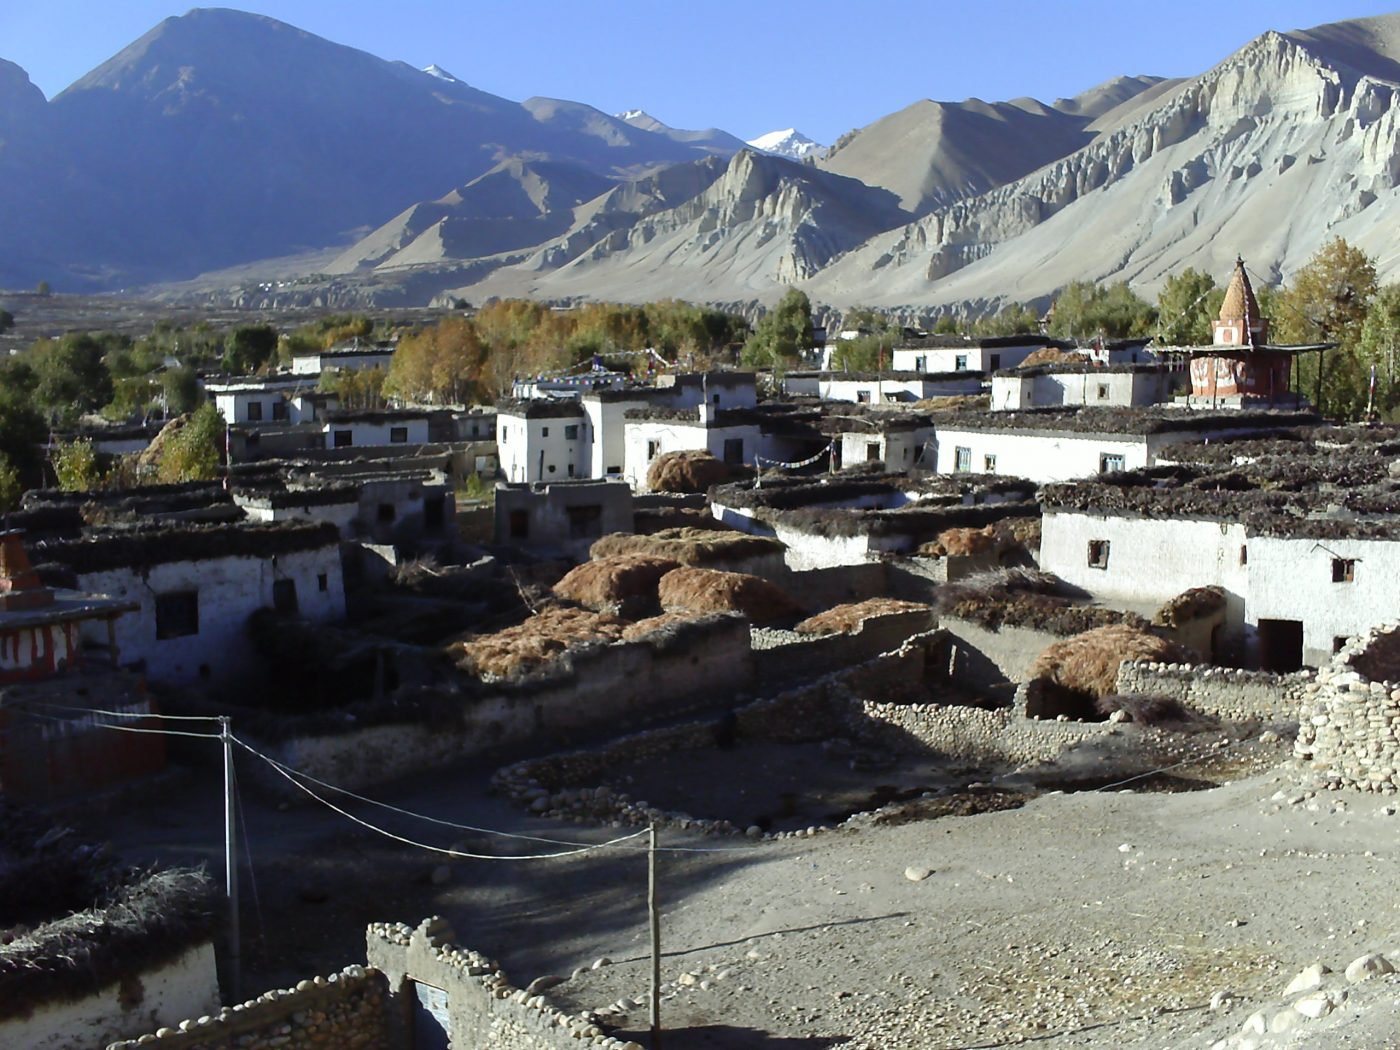 Tsarang village mustang